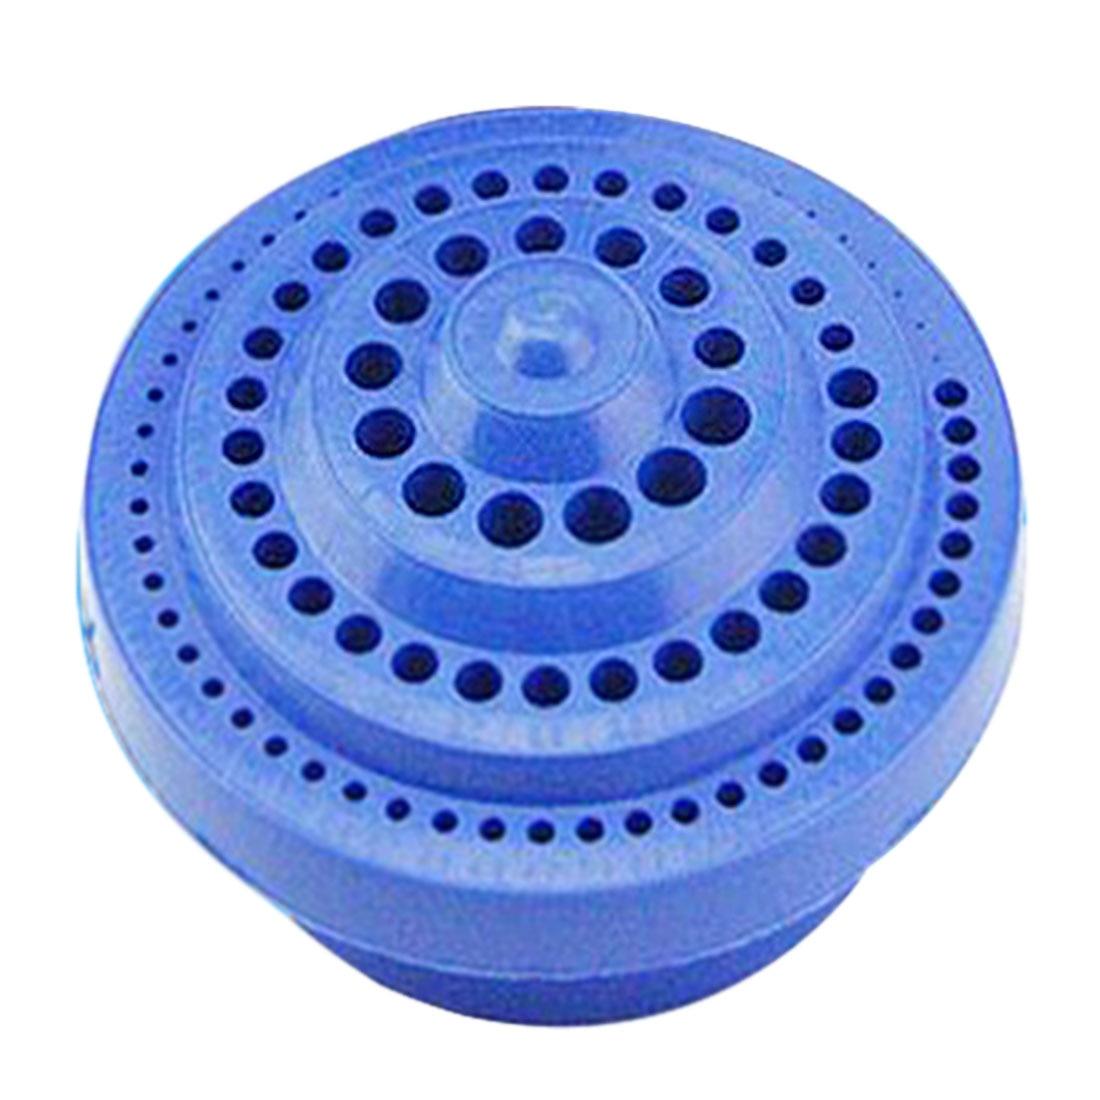 цена на Round Shape Plastic Hard Drill Bit Storage Case - Blue 1-13mm